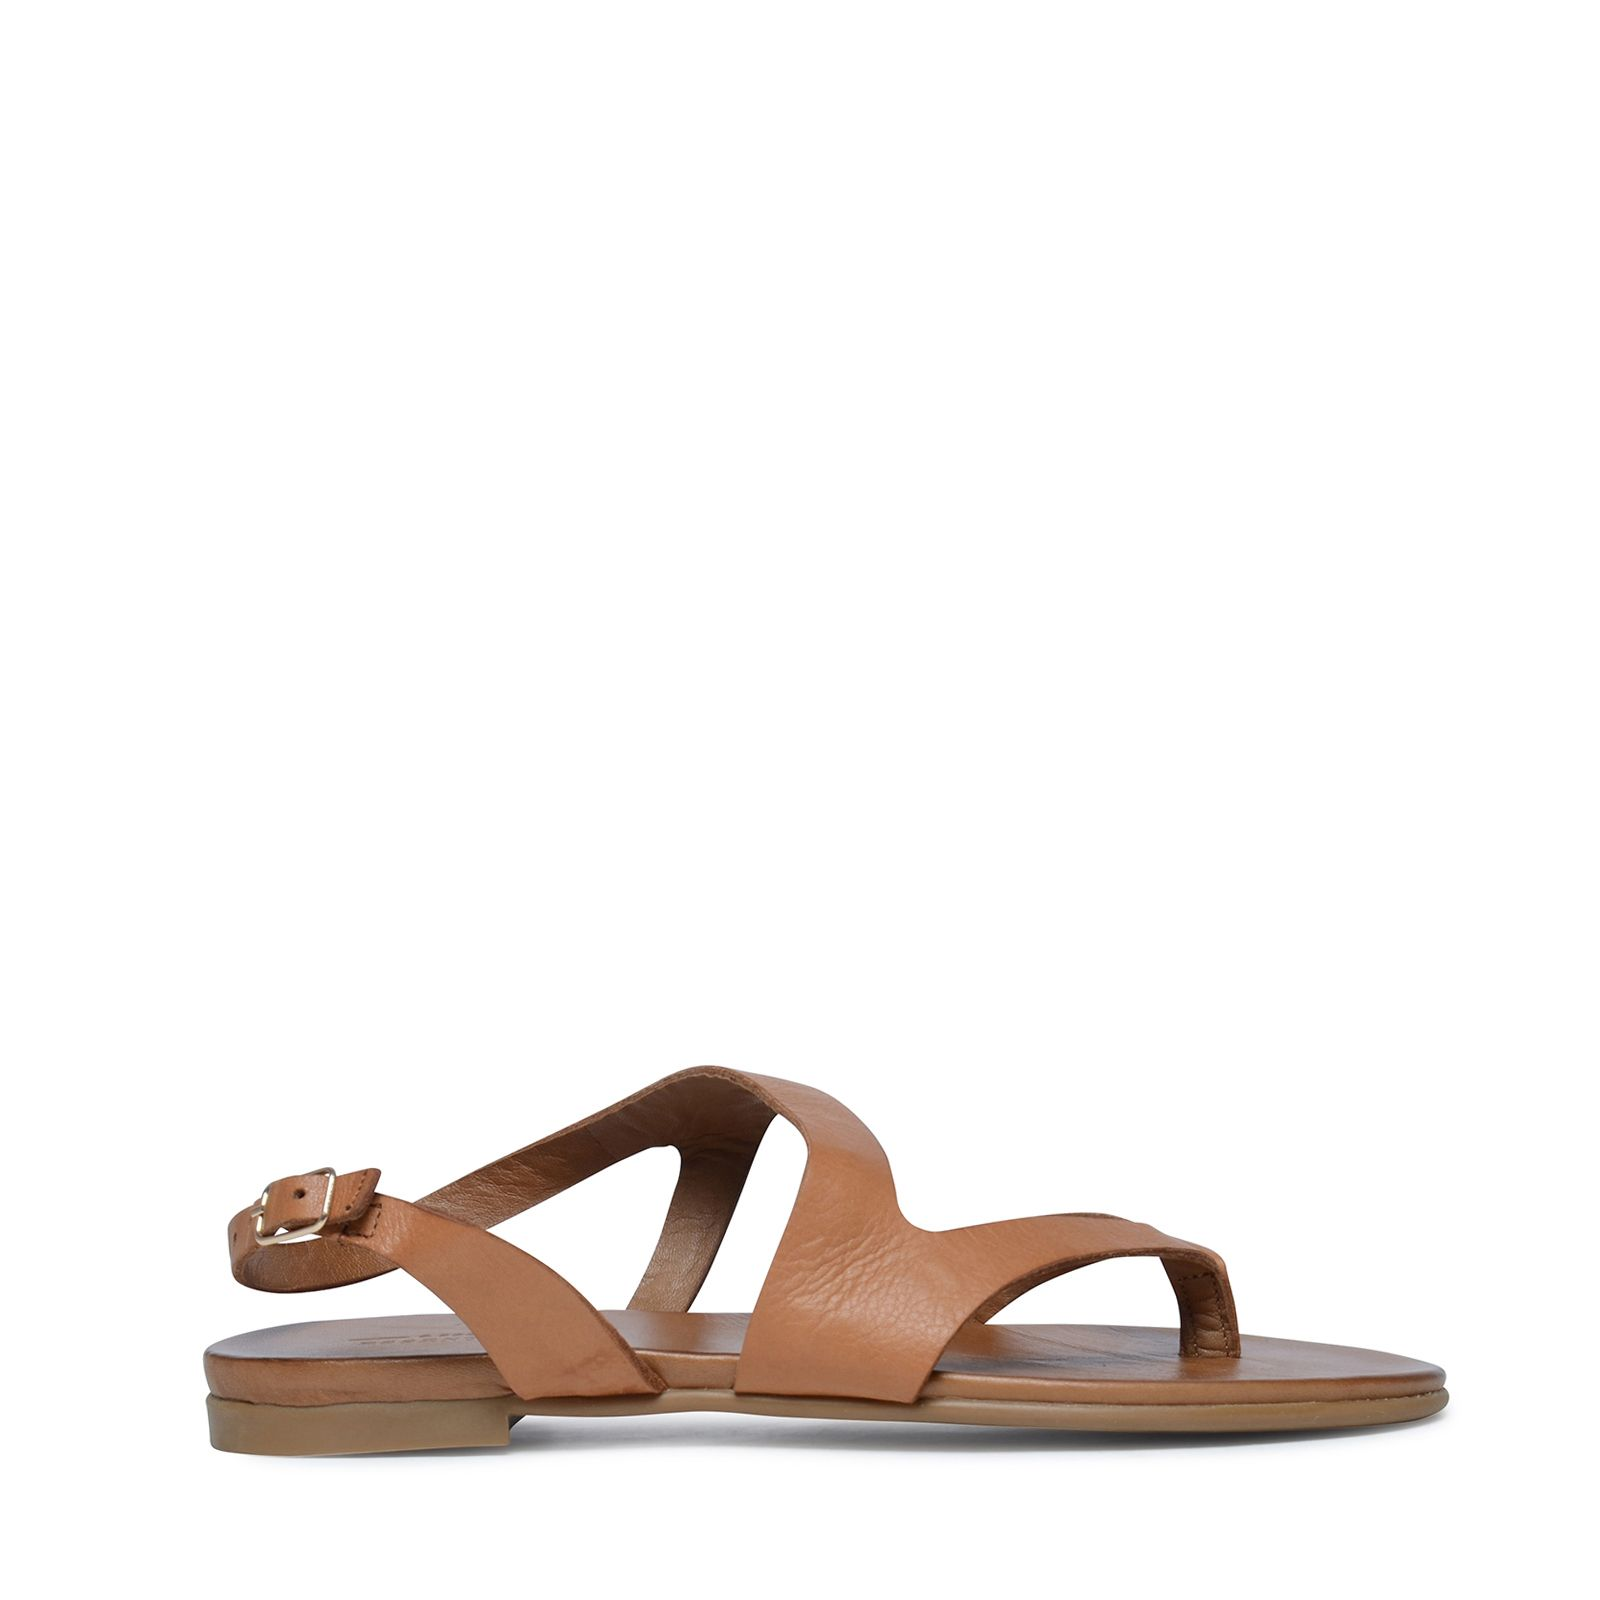 Braune Sandalen Leder Sacha Damenschuhe – 9I2EWDH